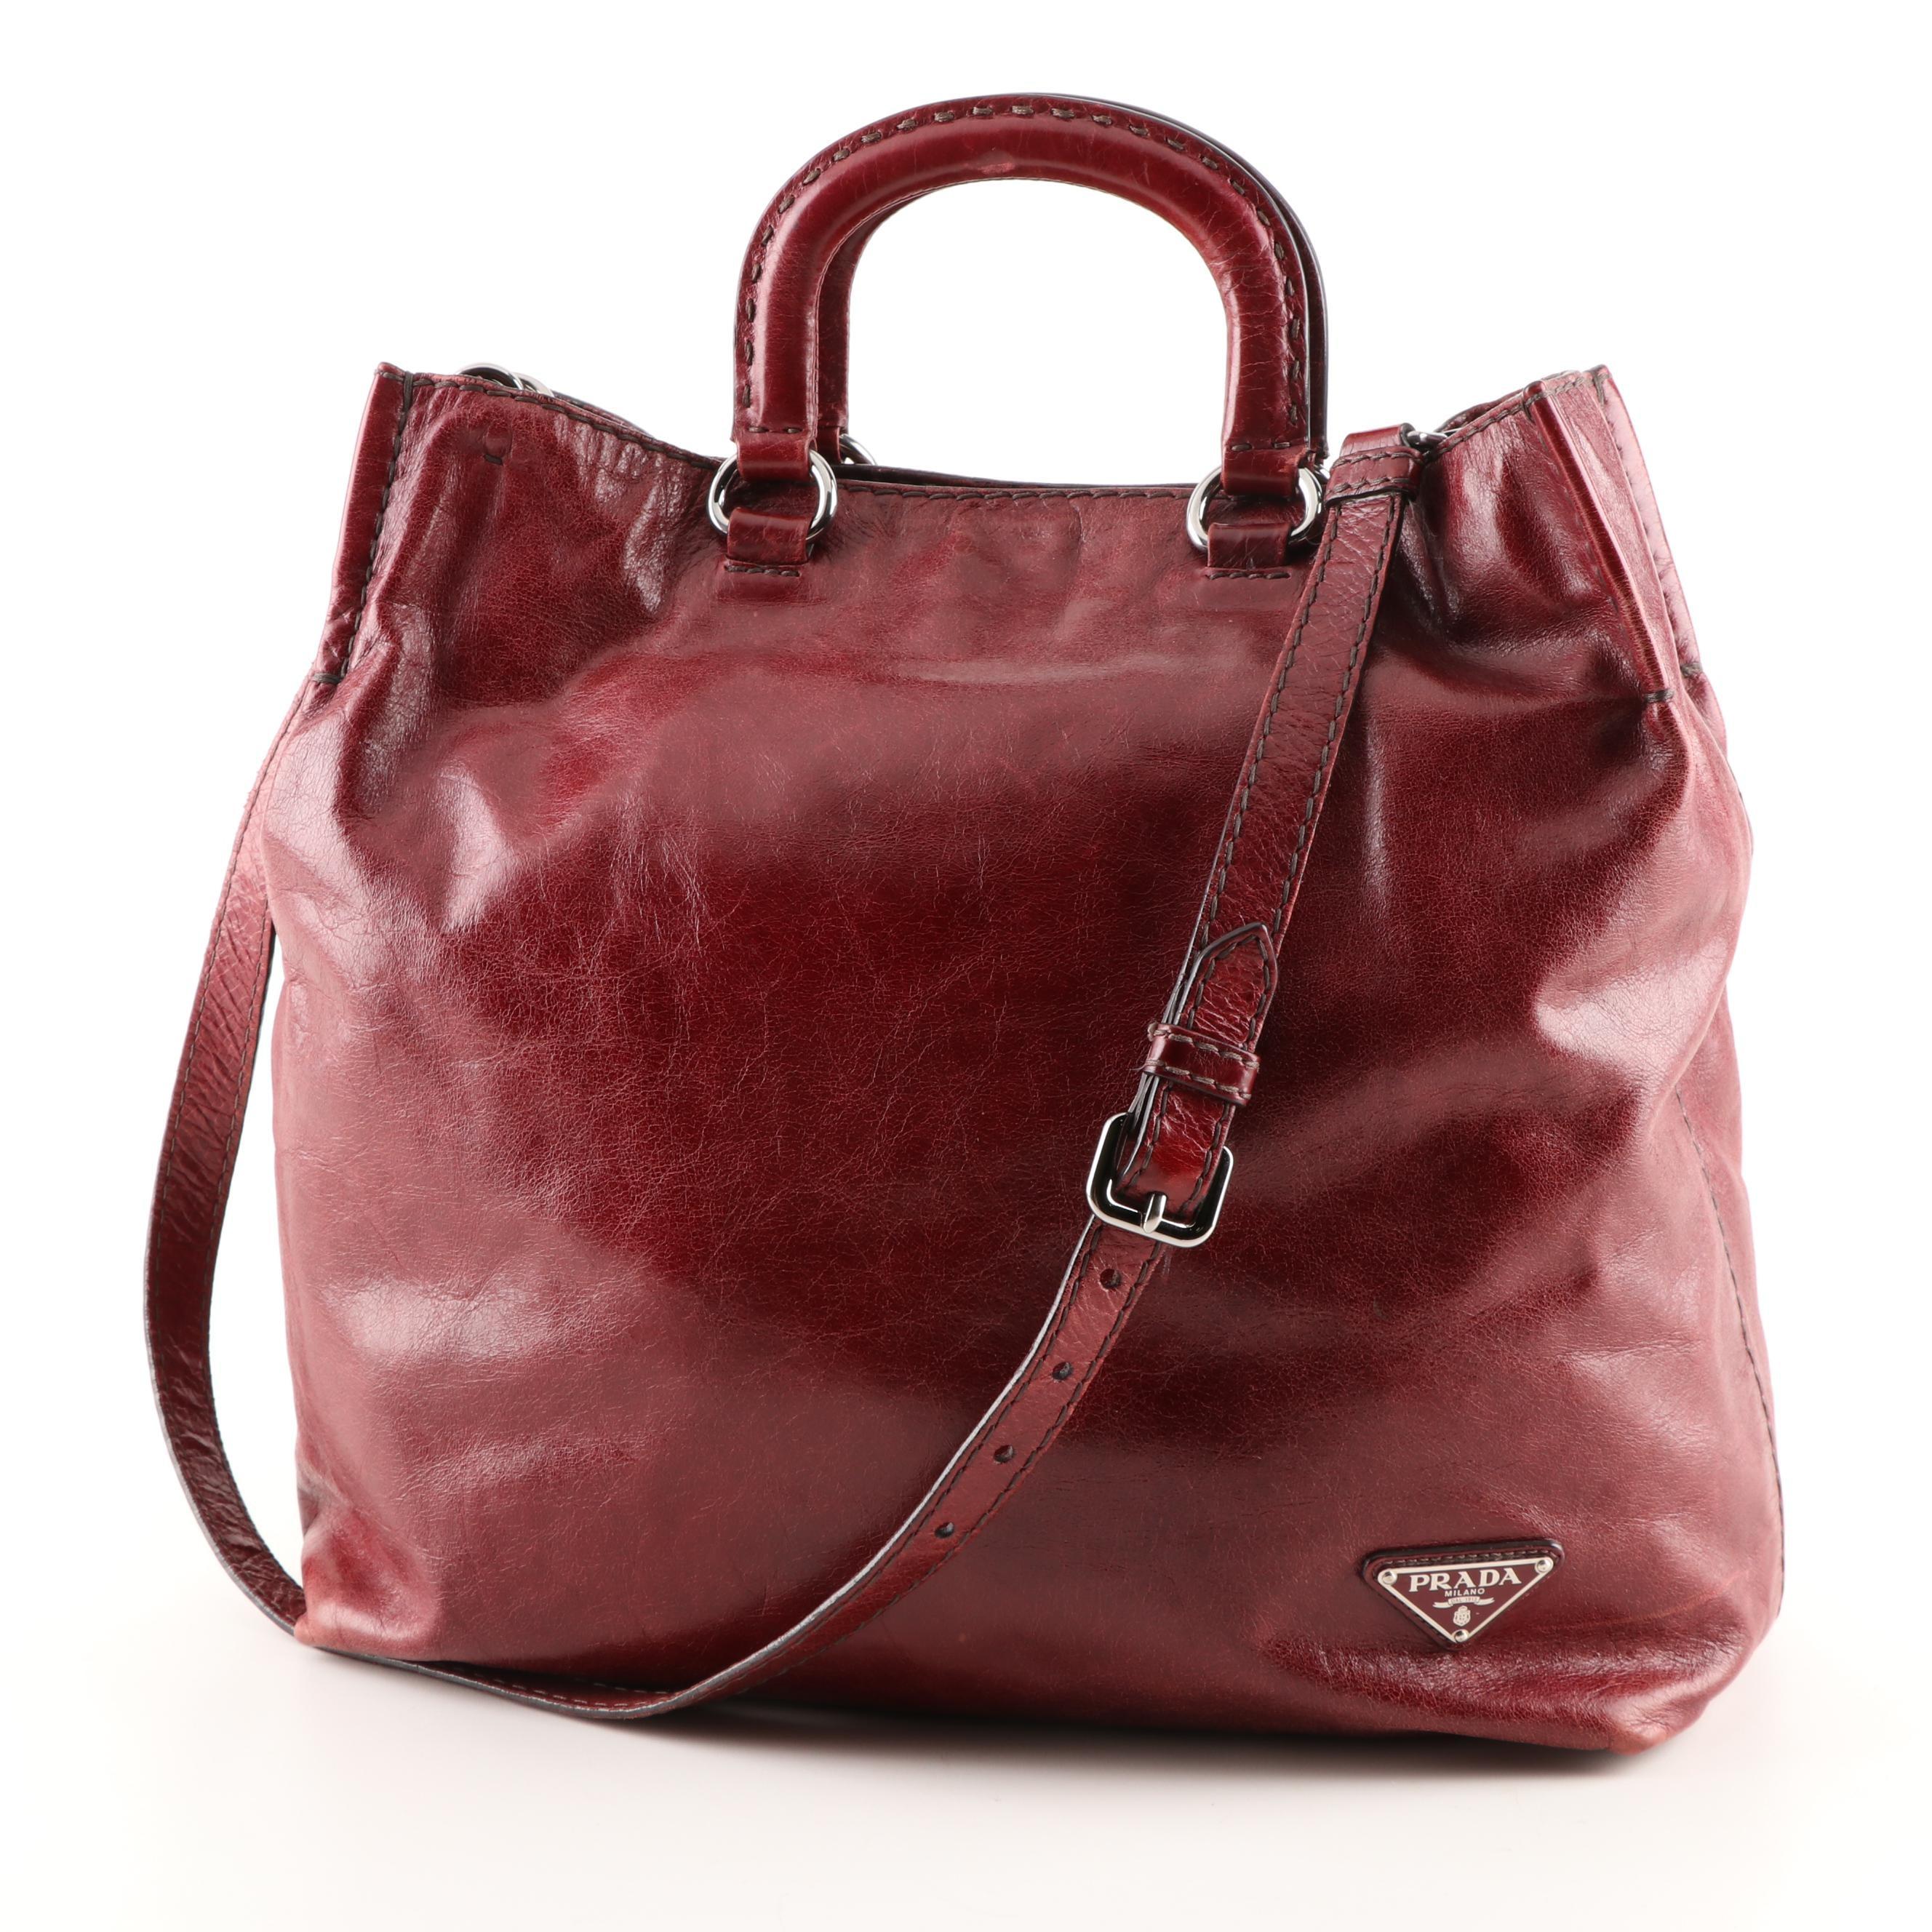 Prada Milano Dark Cabernet Leather Tote Handbag